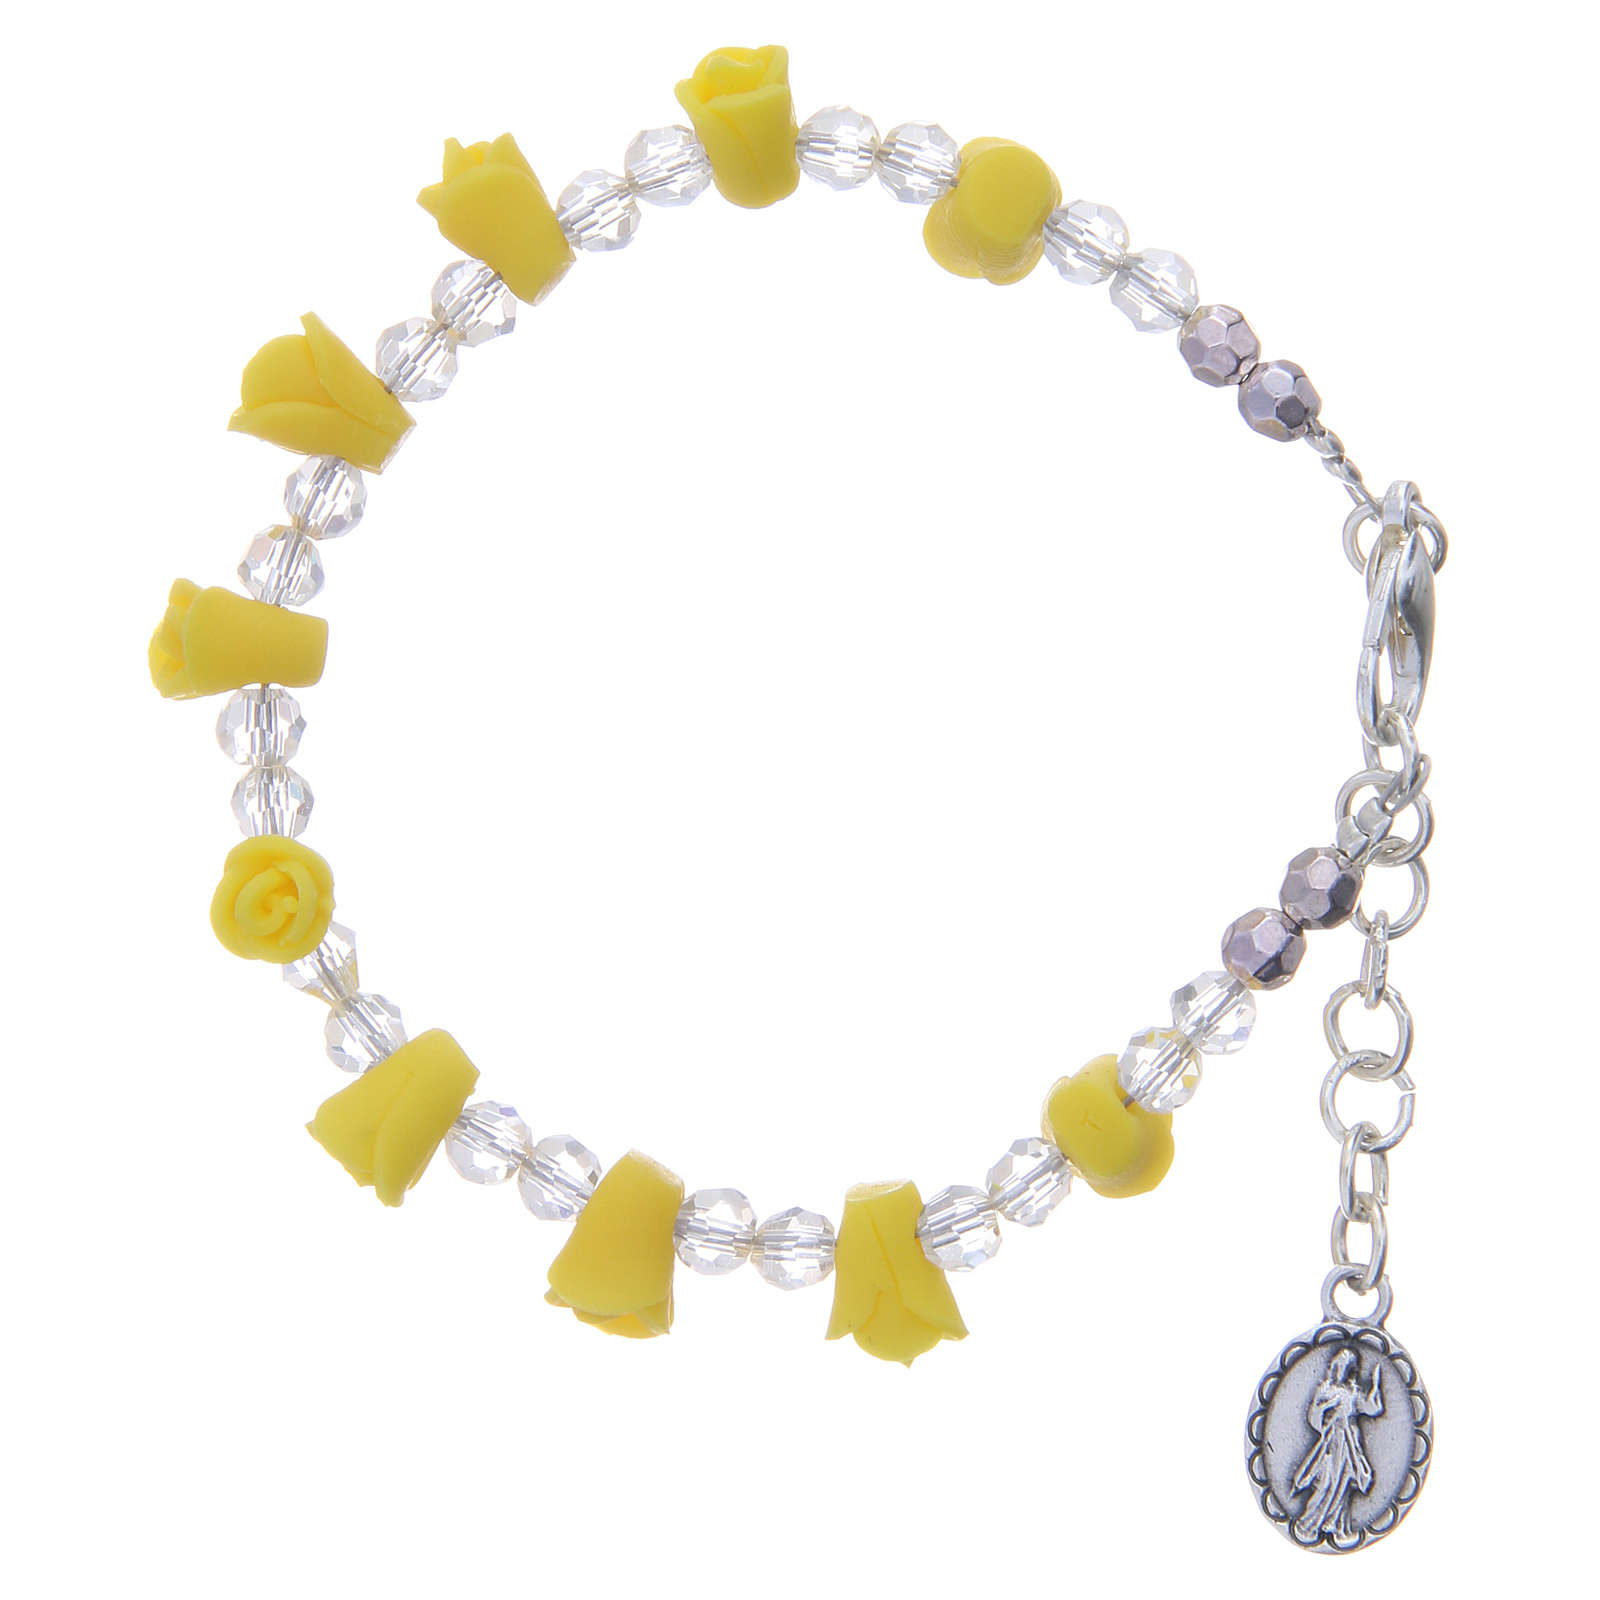 Bracciale rosario Medjugorje giallo icona Madonna 4